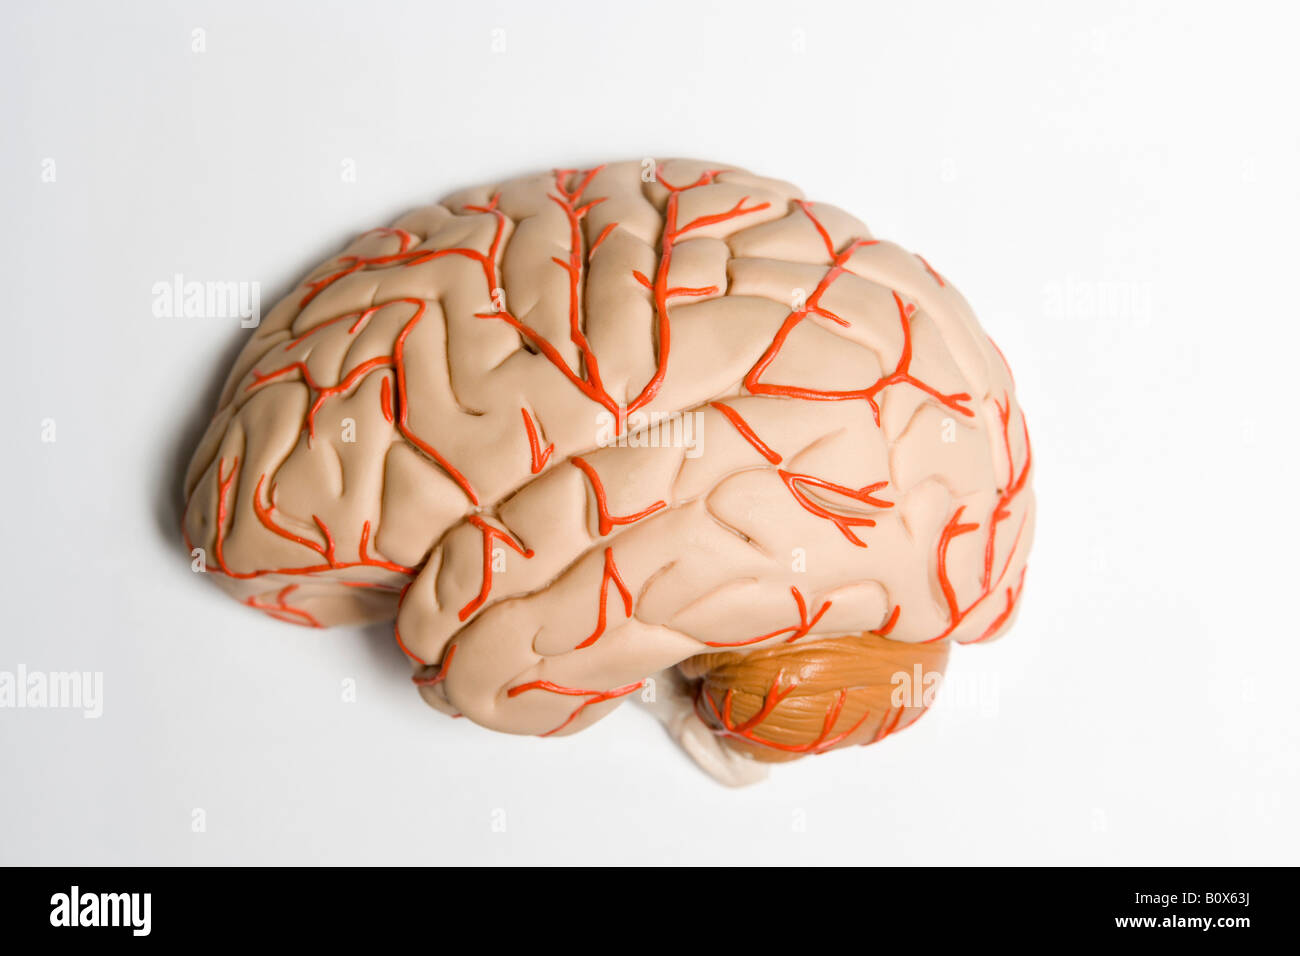 Human Brain Model Side View Stock Photos & Human Brain Model Side ...